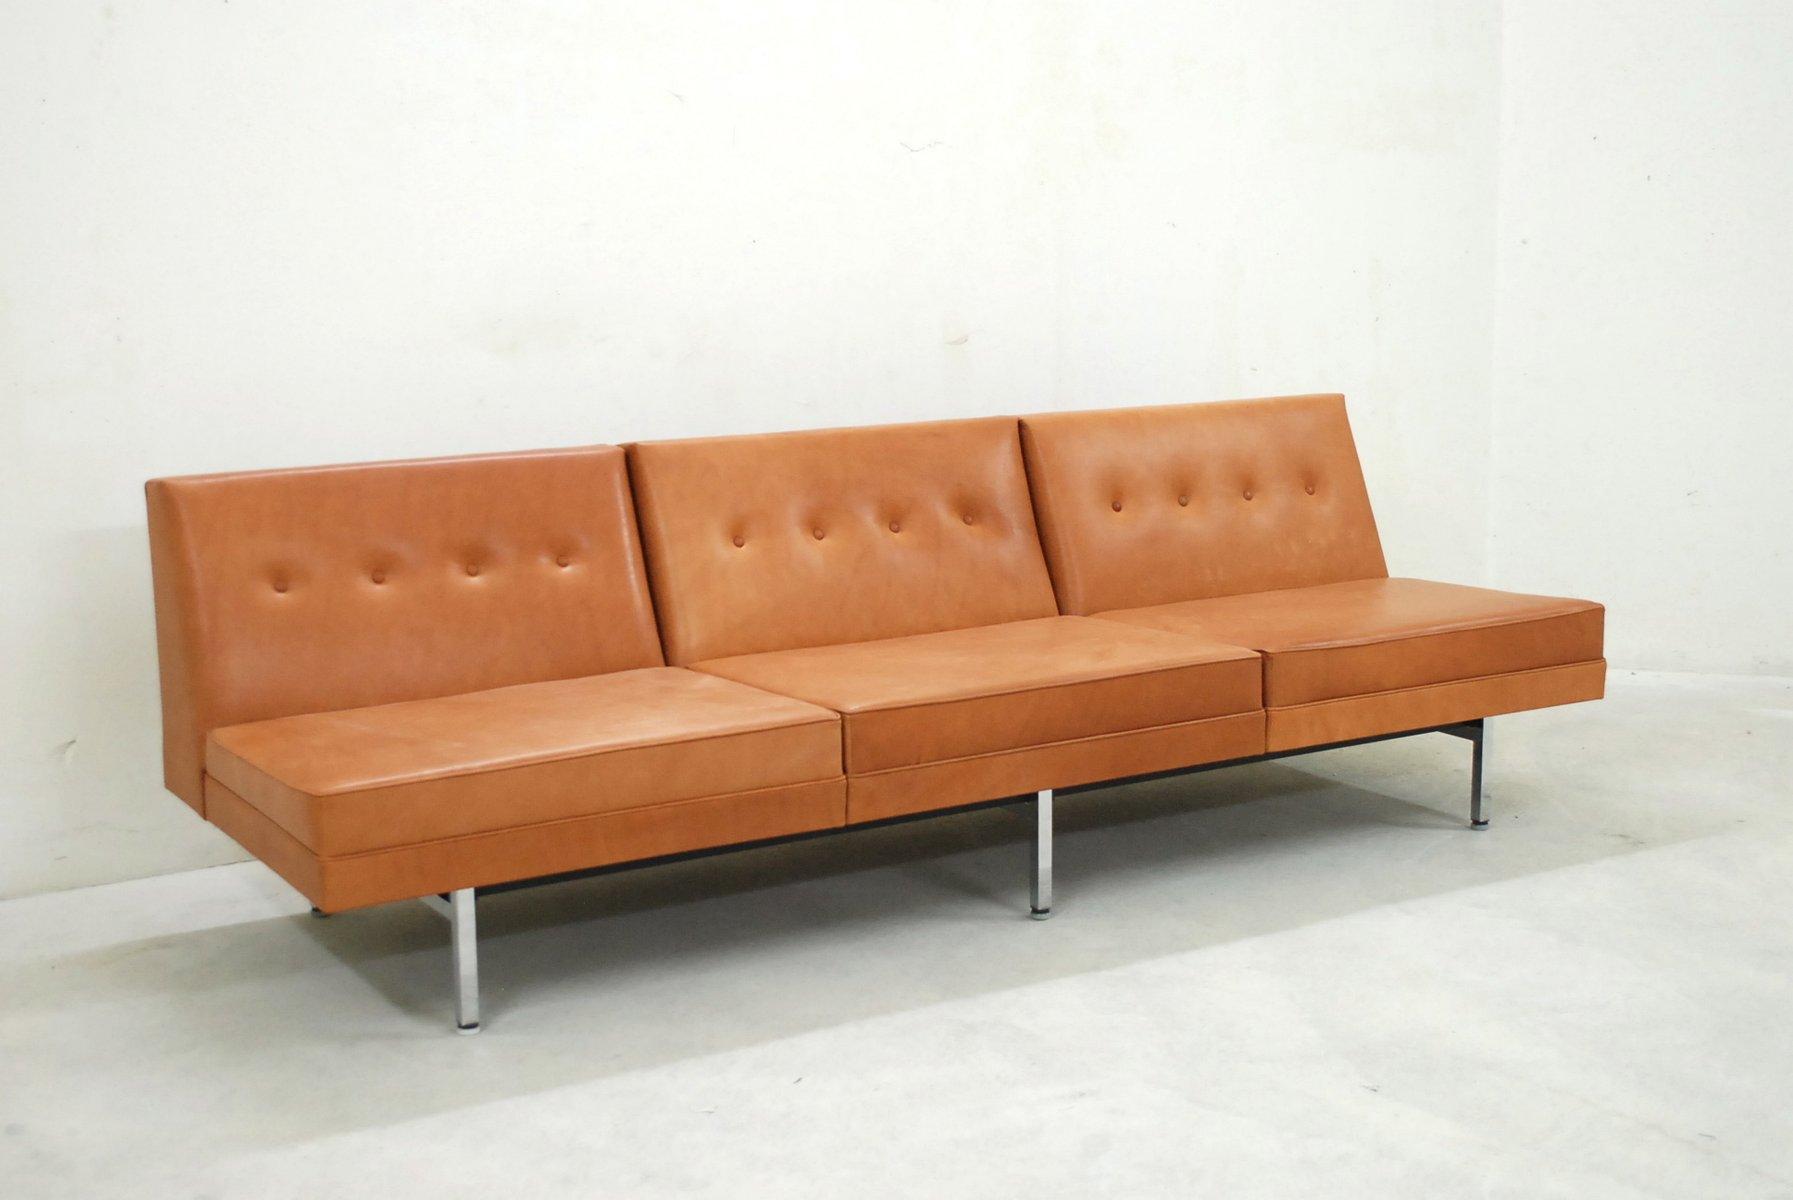 modulares cognac ledersofa set von george nelson f r. Black Bedroom Furniture Sets. Home Design Ideas